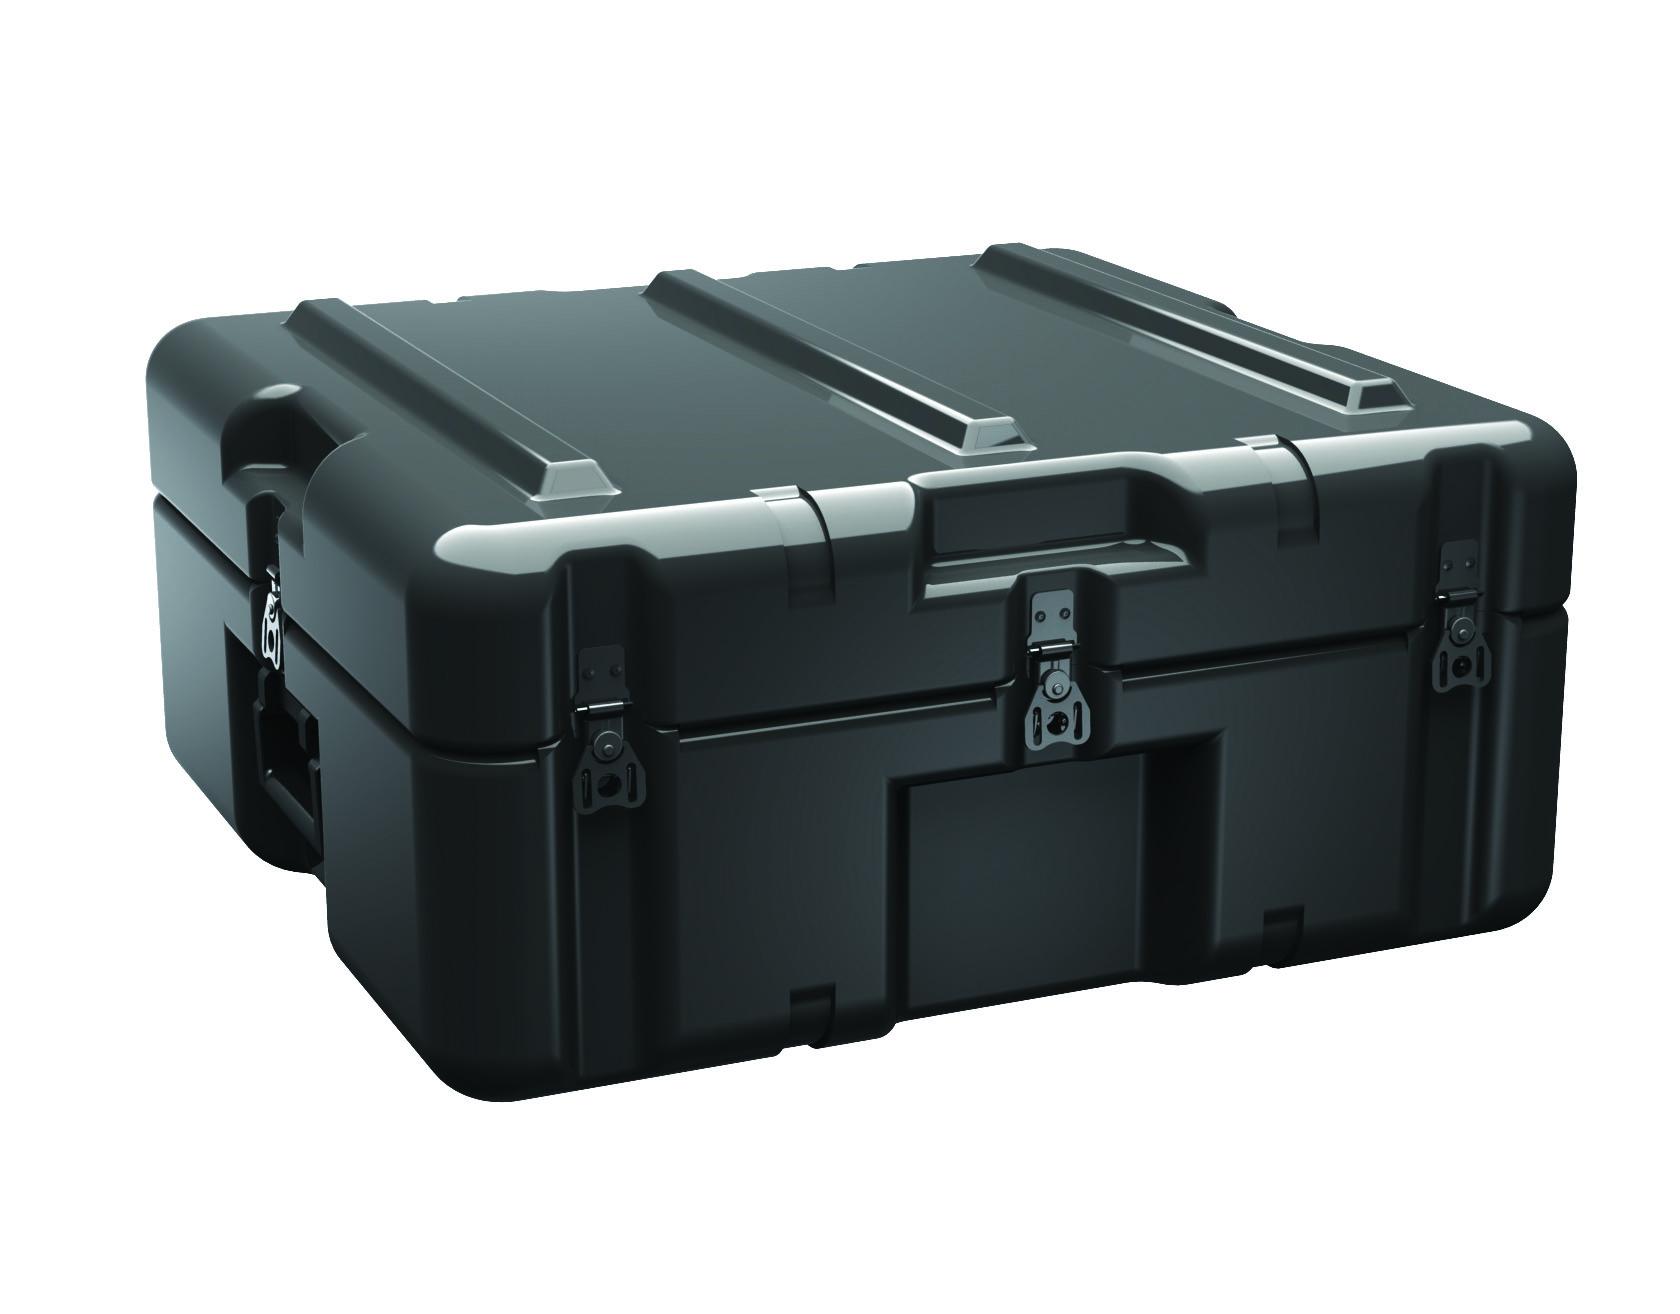 AL2221-0604 - Pelican Hardigg AL2221-0604 Flat Shipping Case